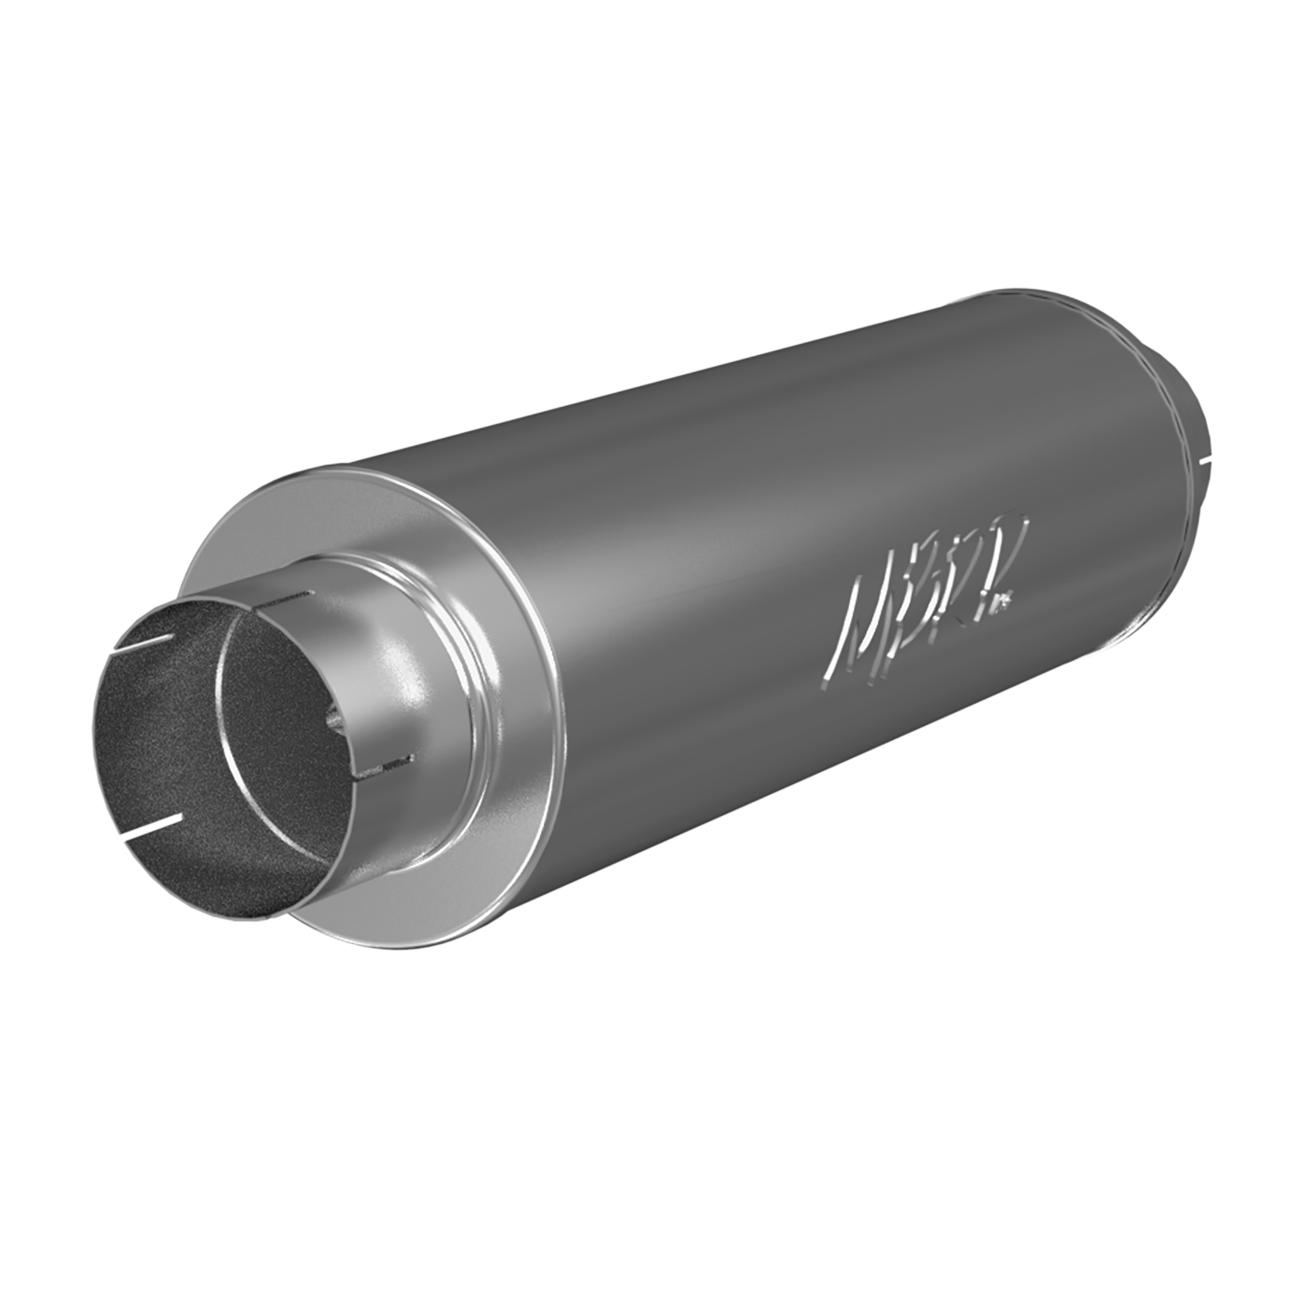 Aluminized Steel MBRP M2050 31 Muffler